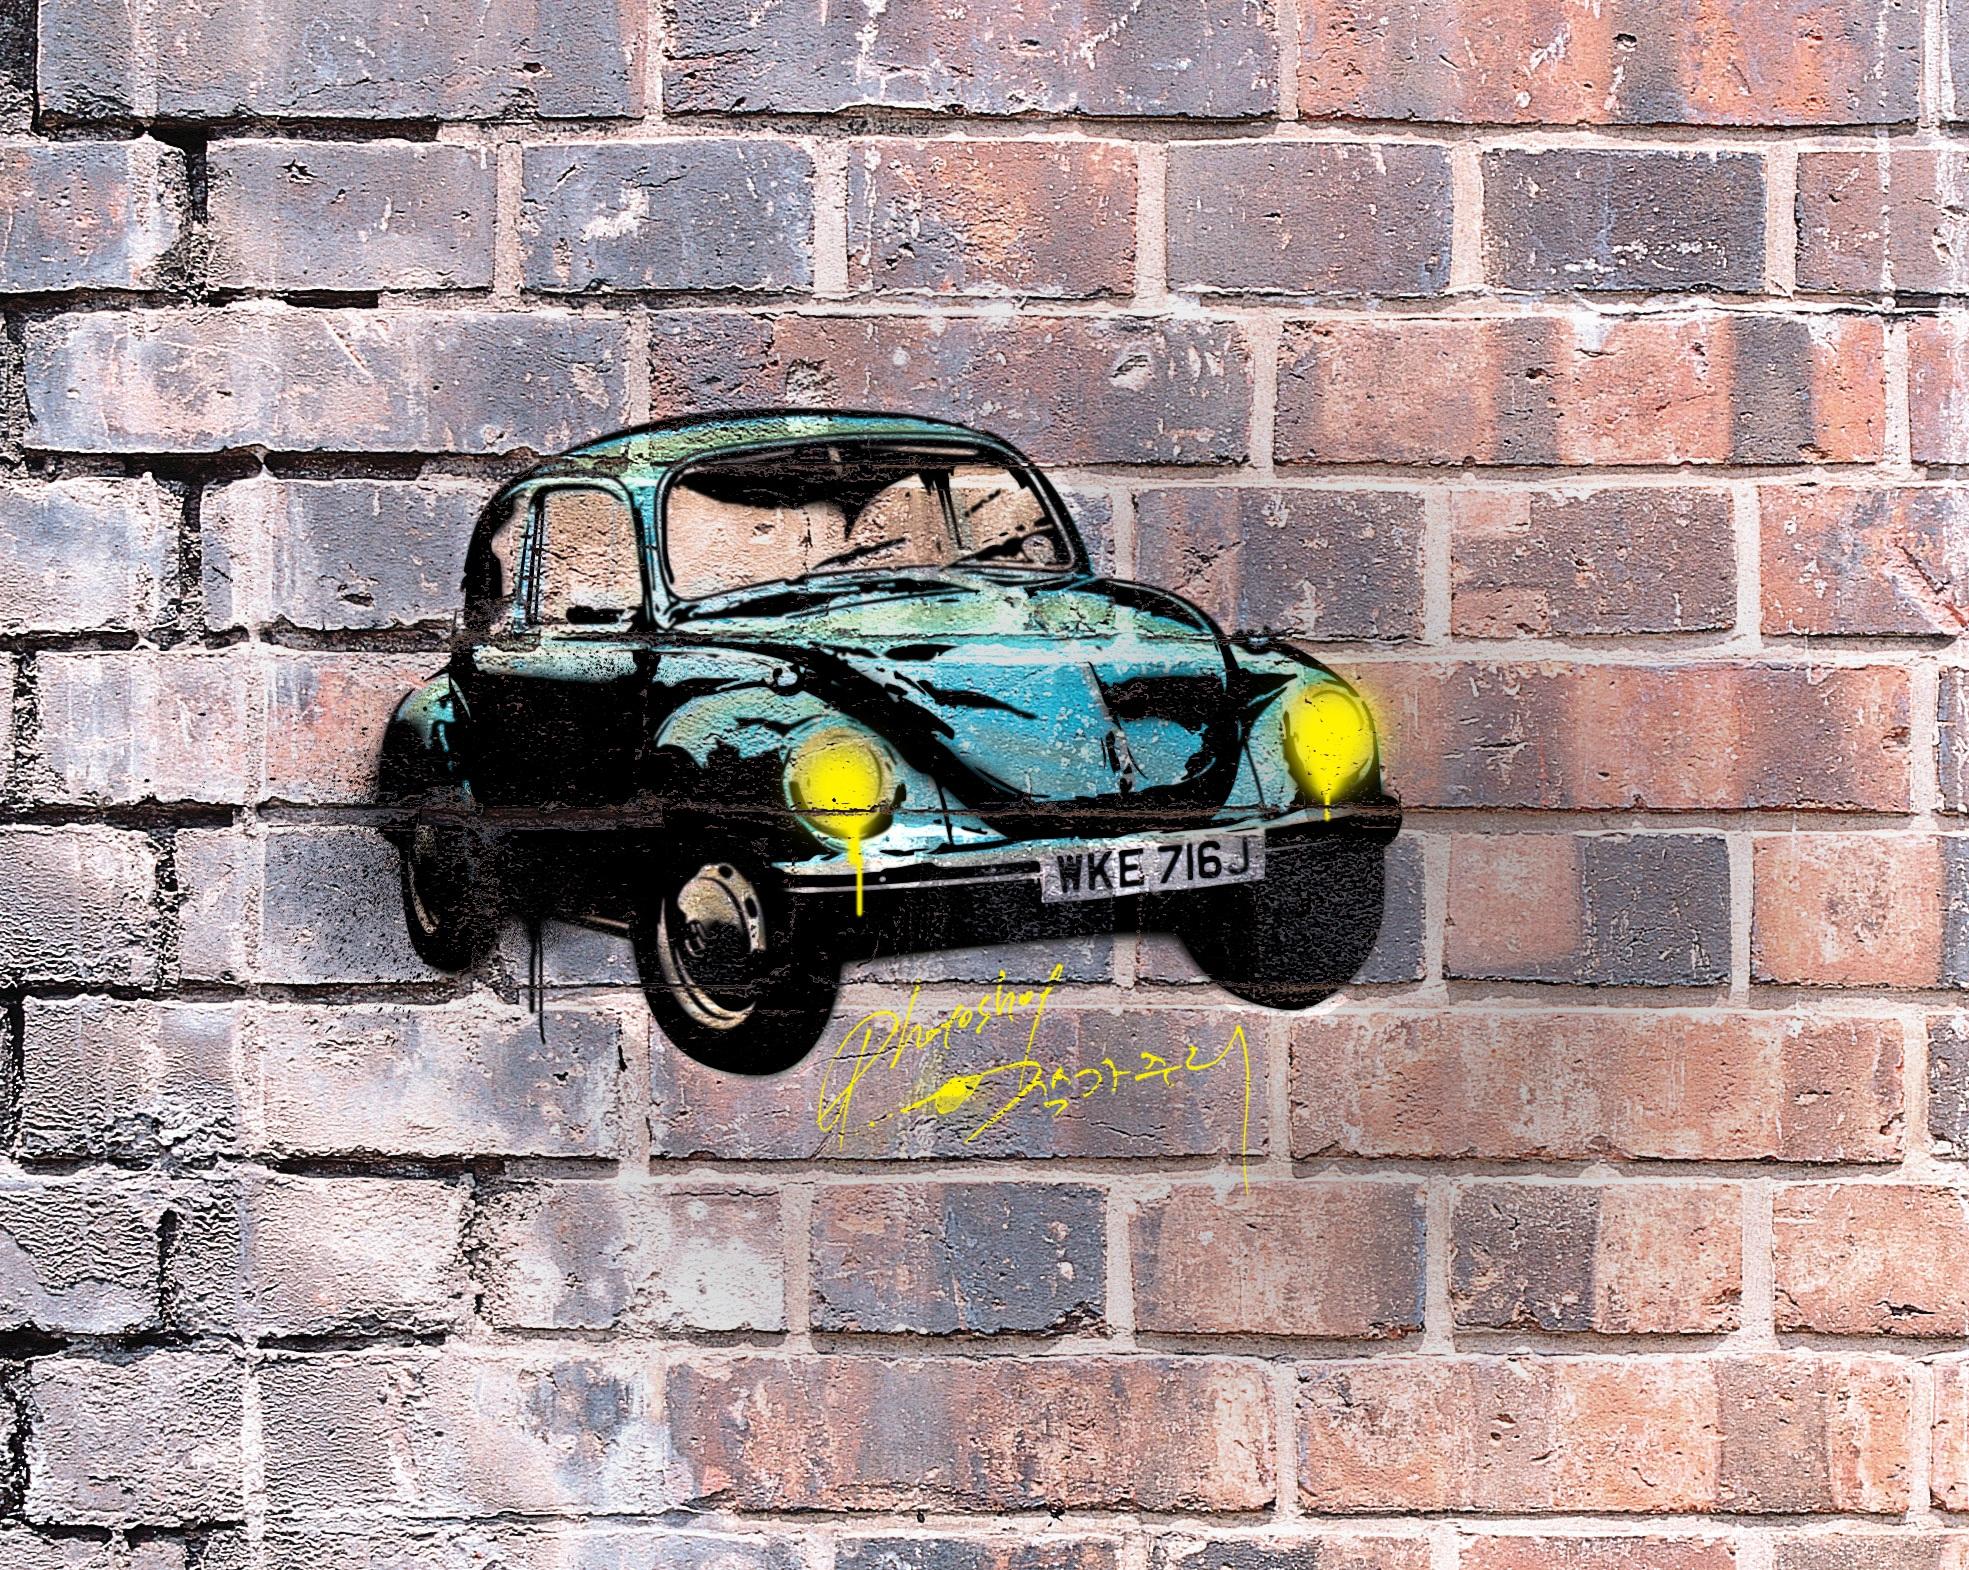 Wallpaper Mobil Classic Sport: Free Images : Analog, Vehicle, Desktop, Sports Car, Street